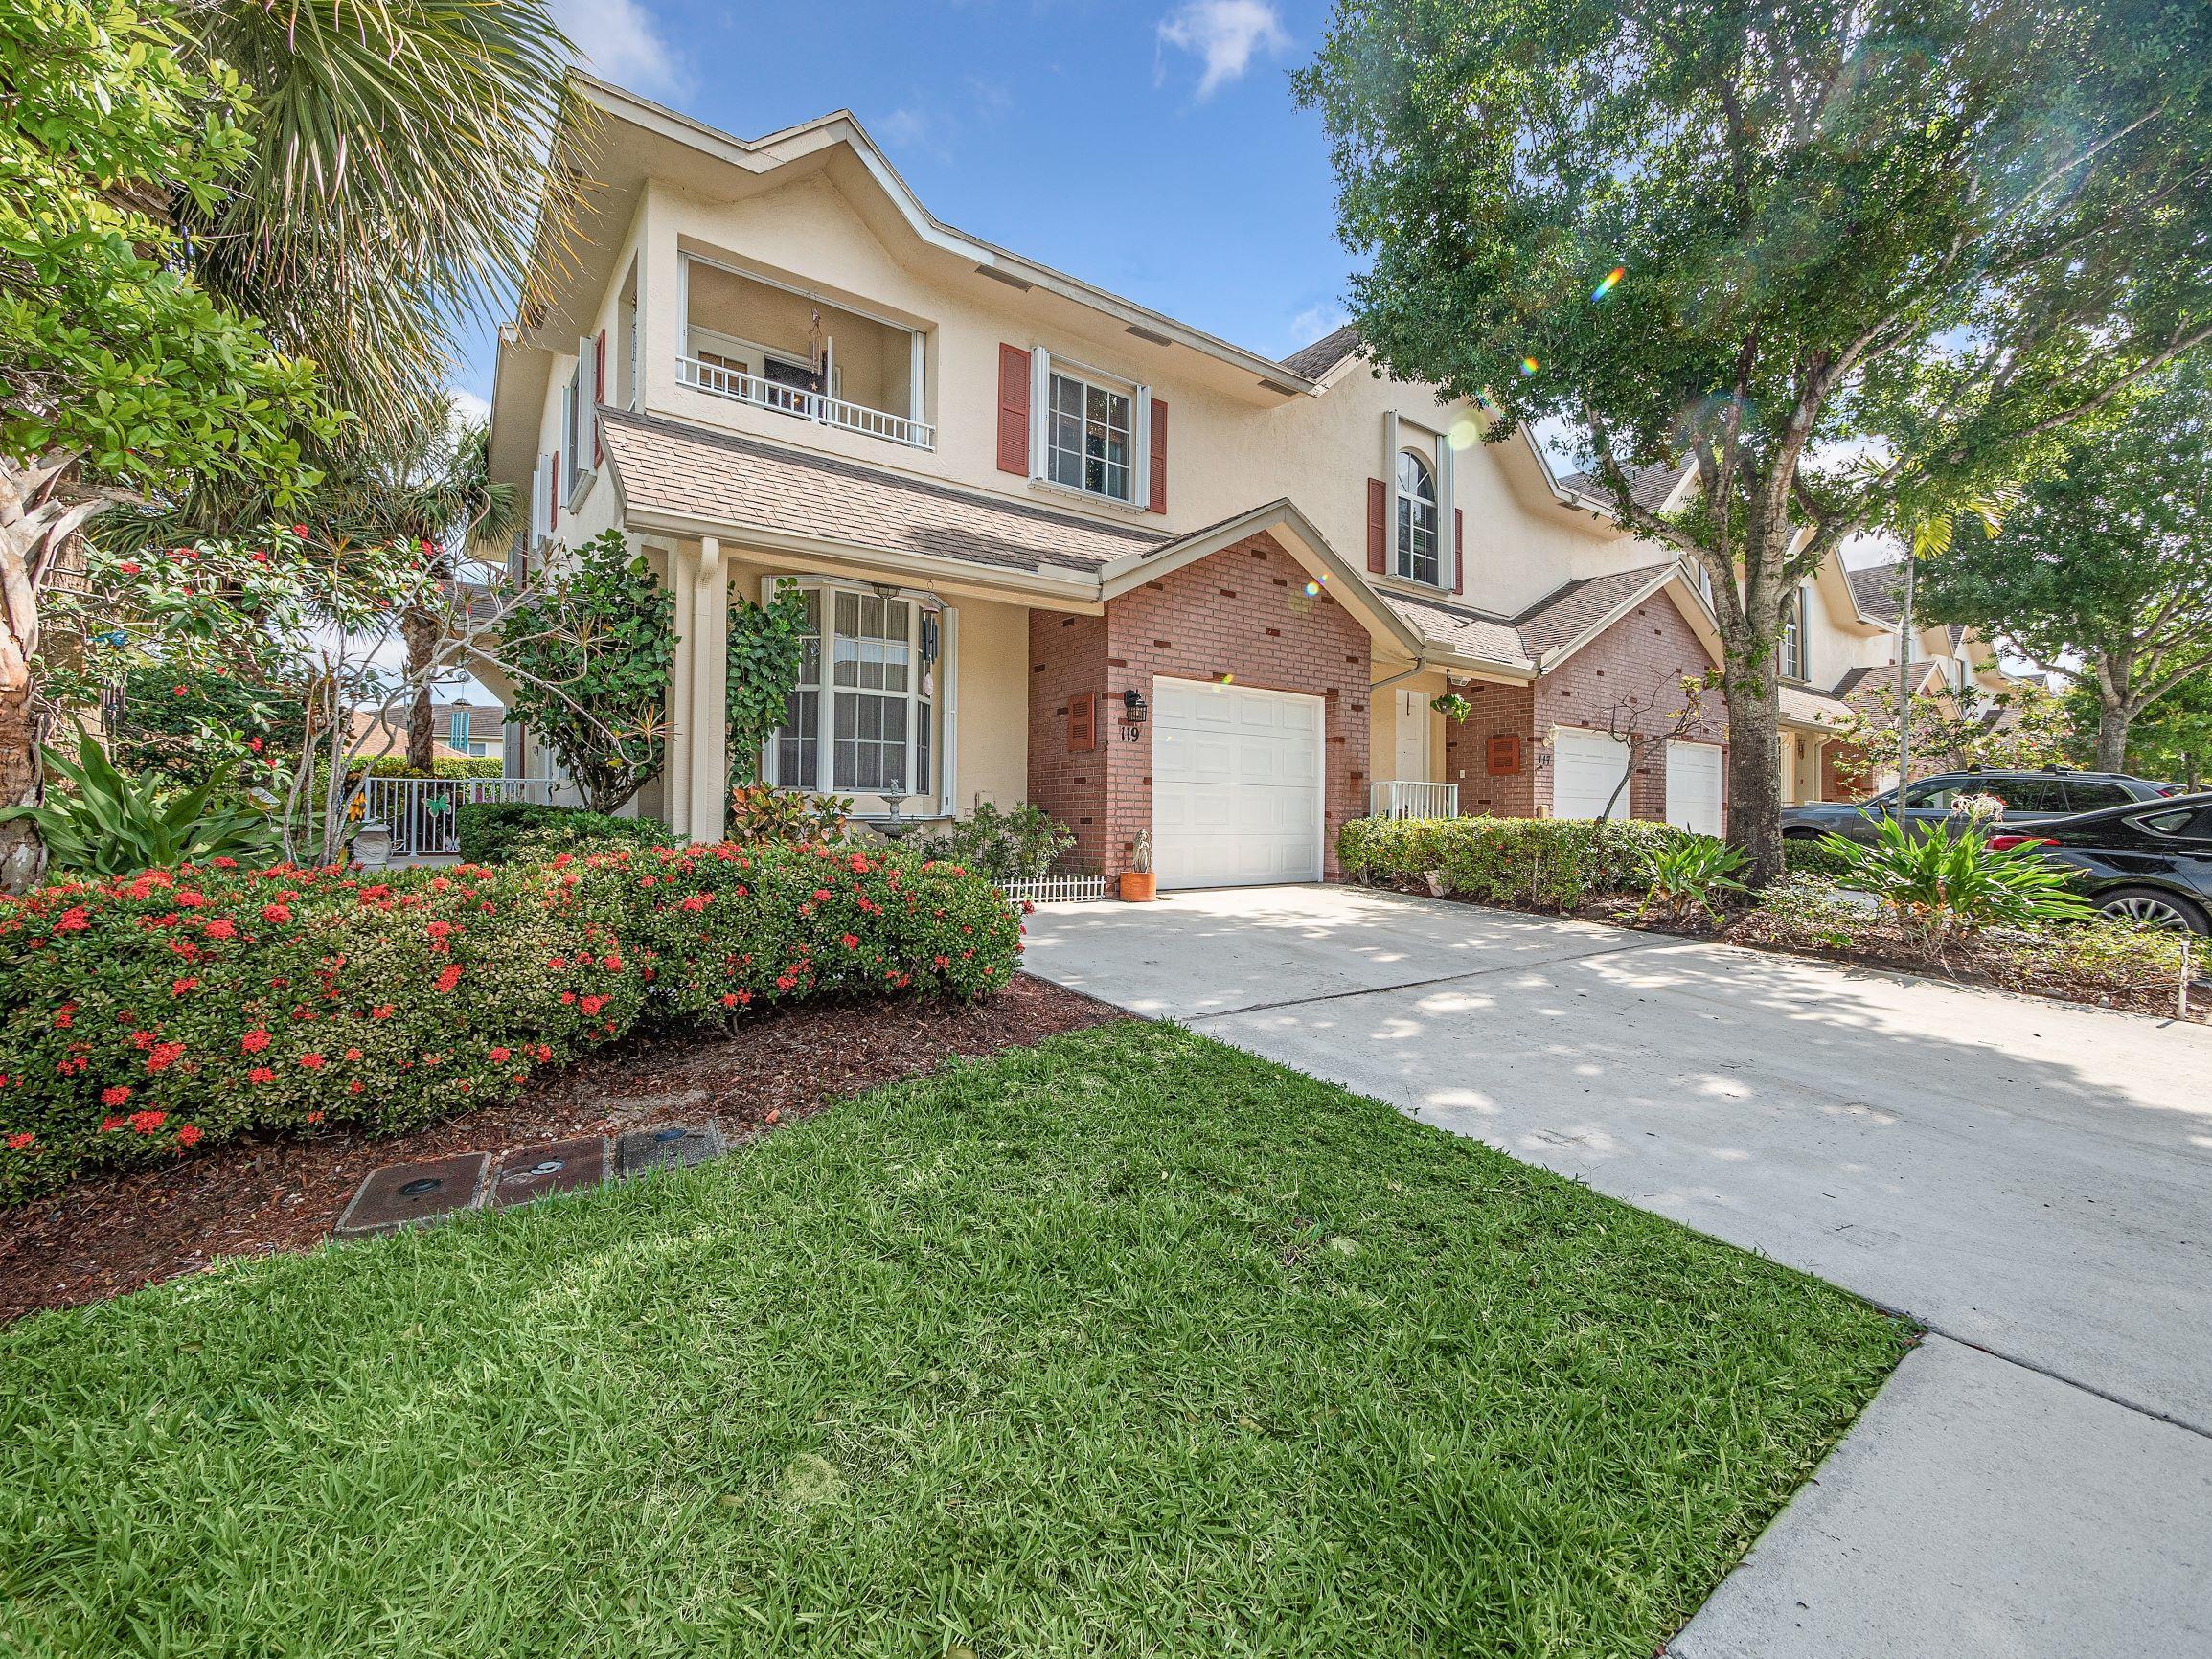 119  Spruce Street  For Sale 10712420, FL